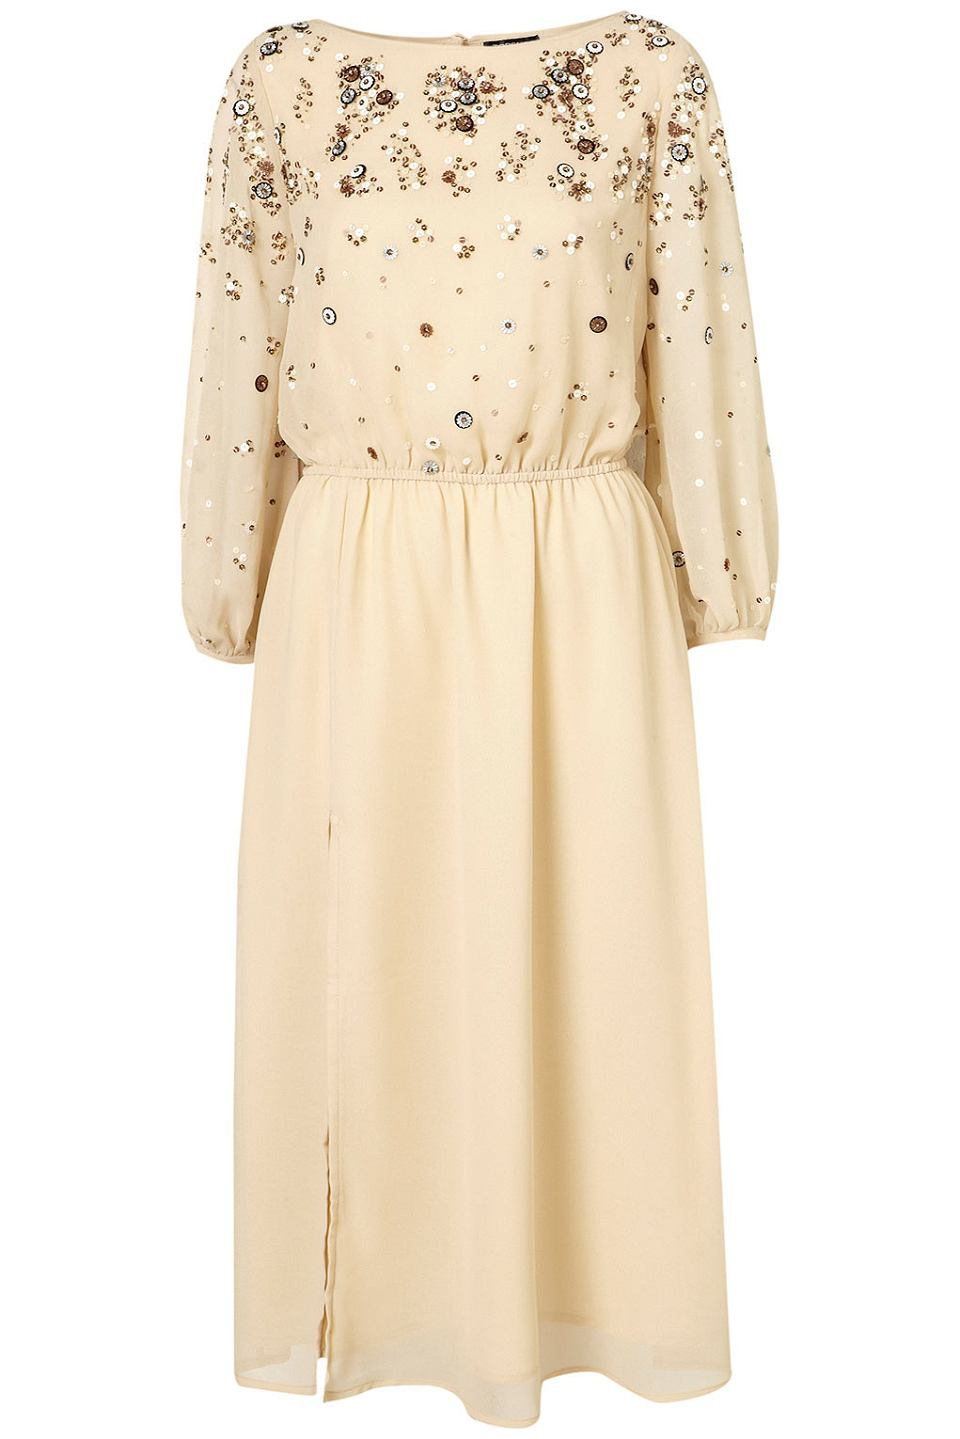 a2c87f61c6 Topshop - limitowana kolekcja sukienek